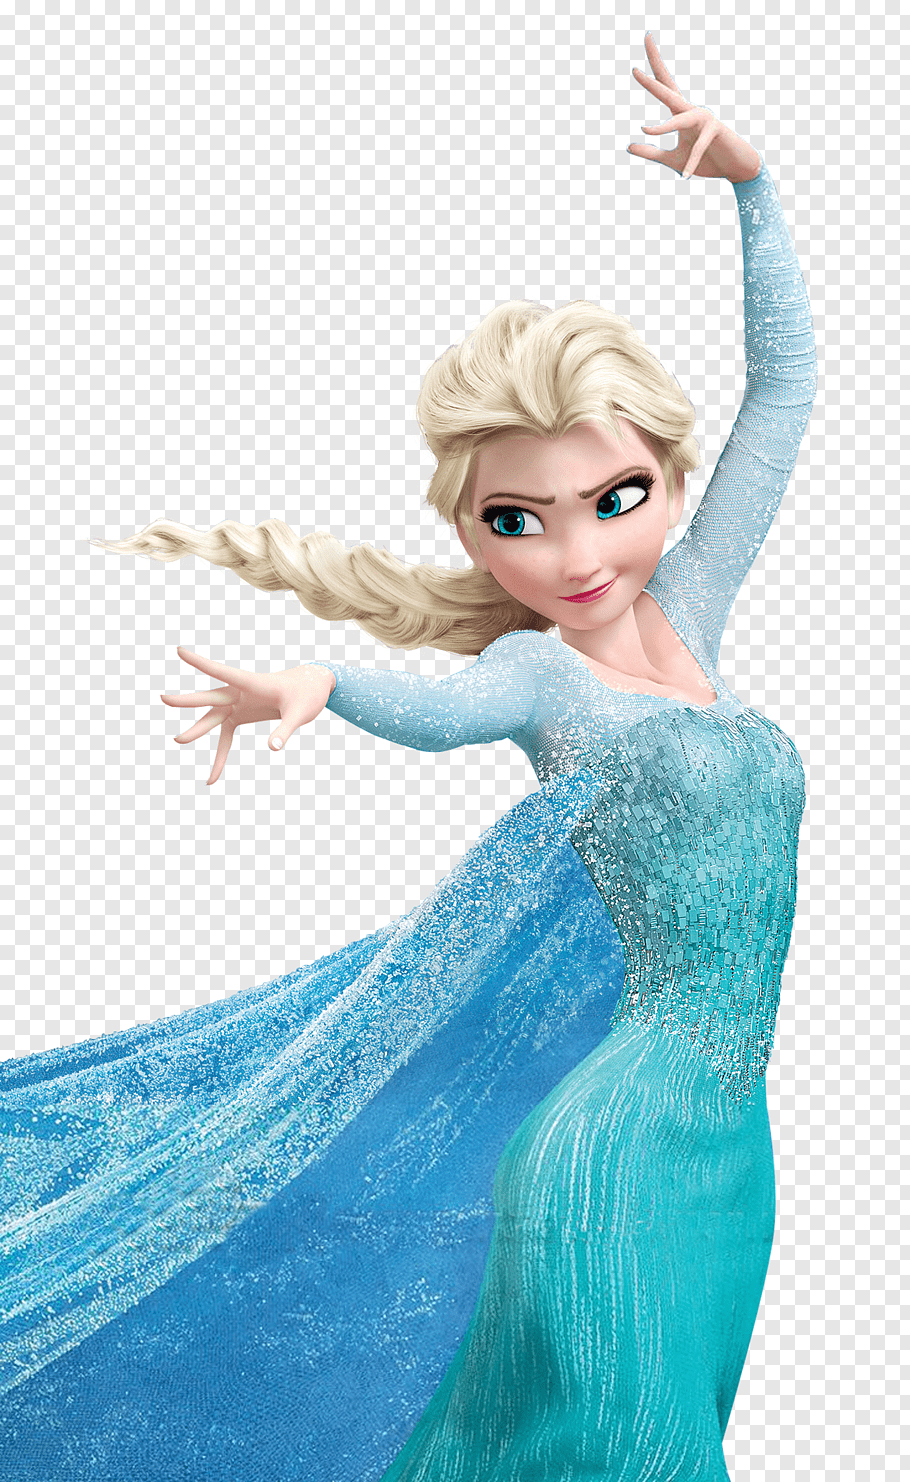 Illustration Of Elsa From Frozen Elsa Frozen Anna Olaf Convite Frozen Fever Free Png Elsa Frozen Princess Anna Frozen Elsa